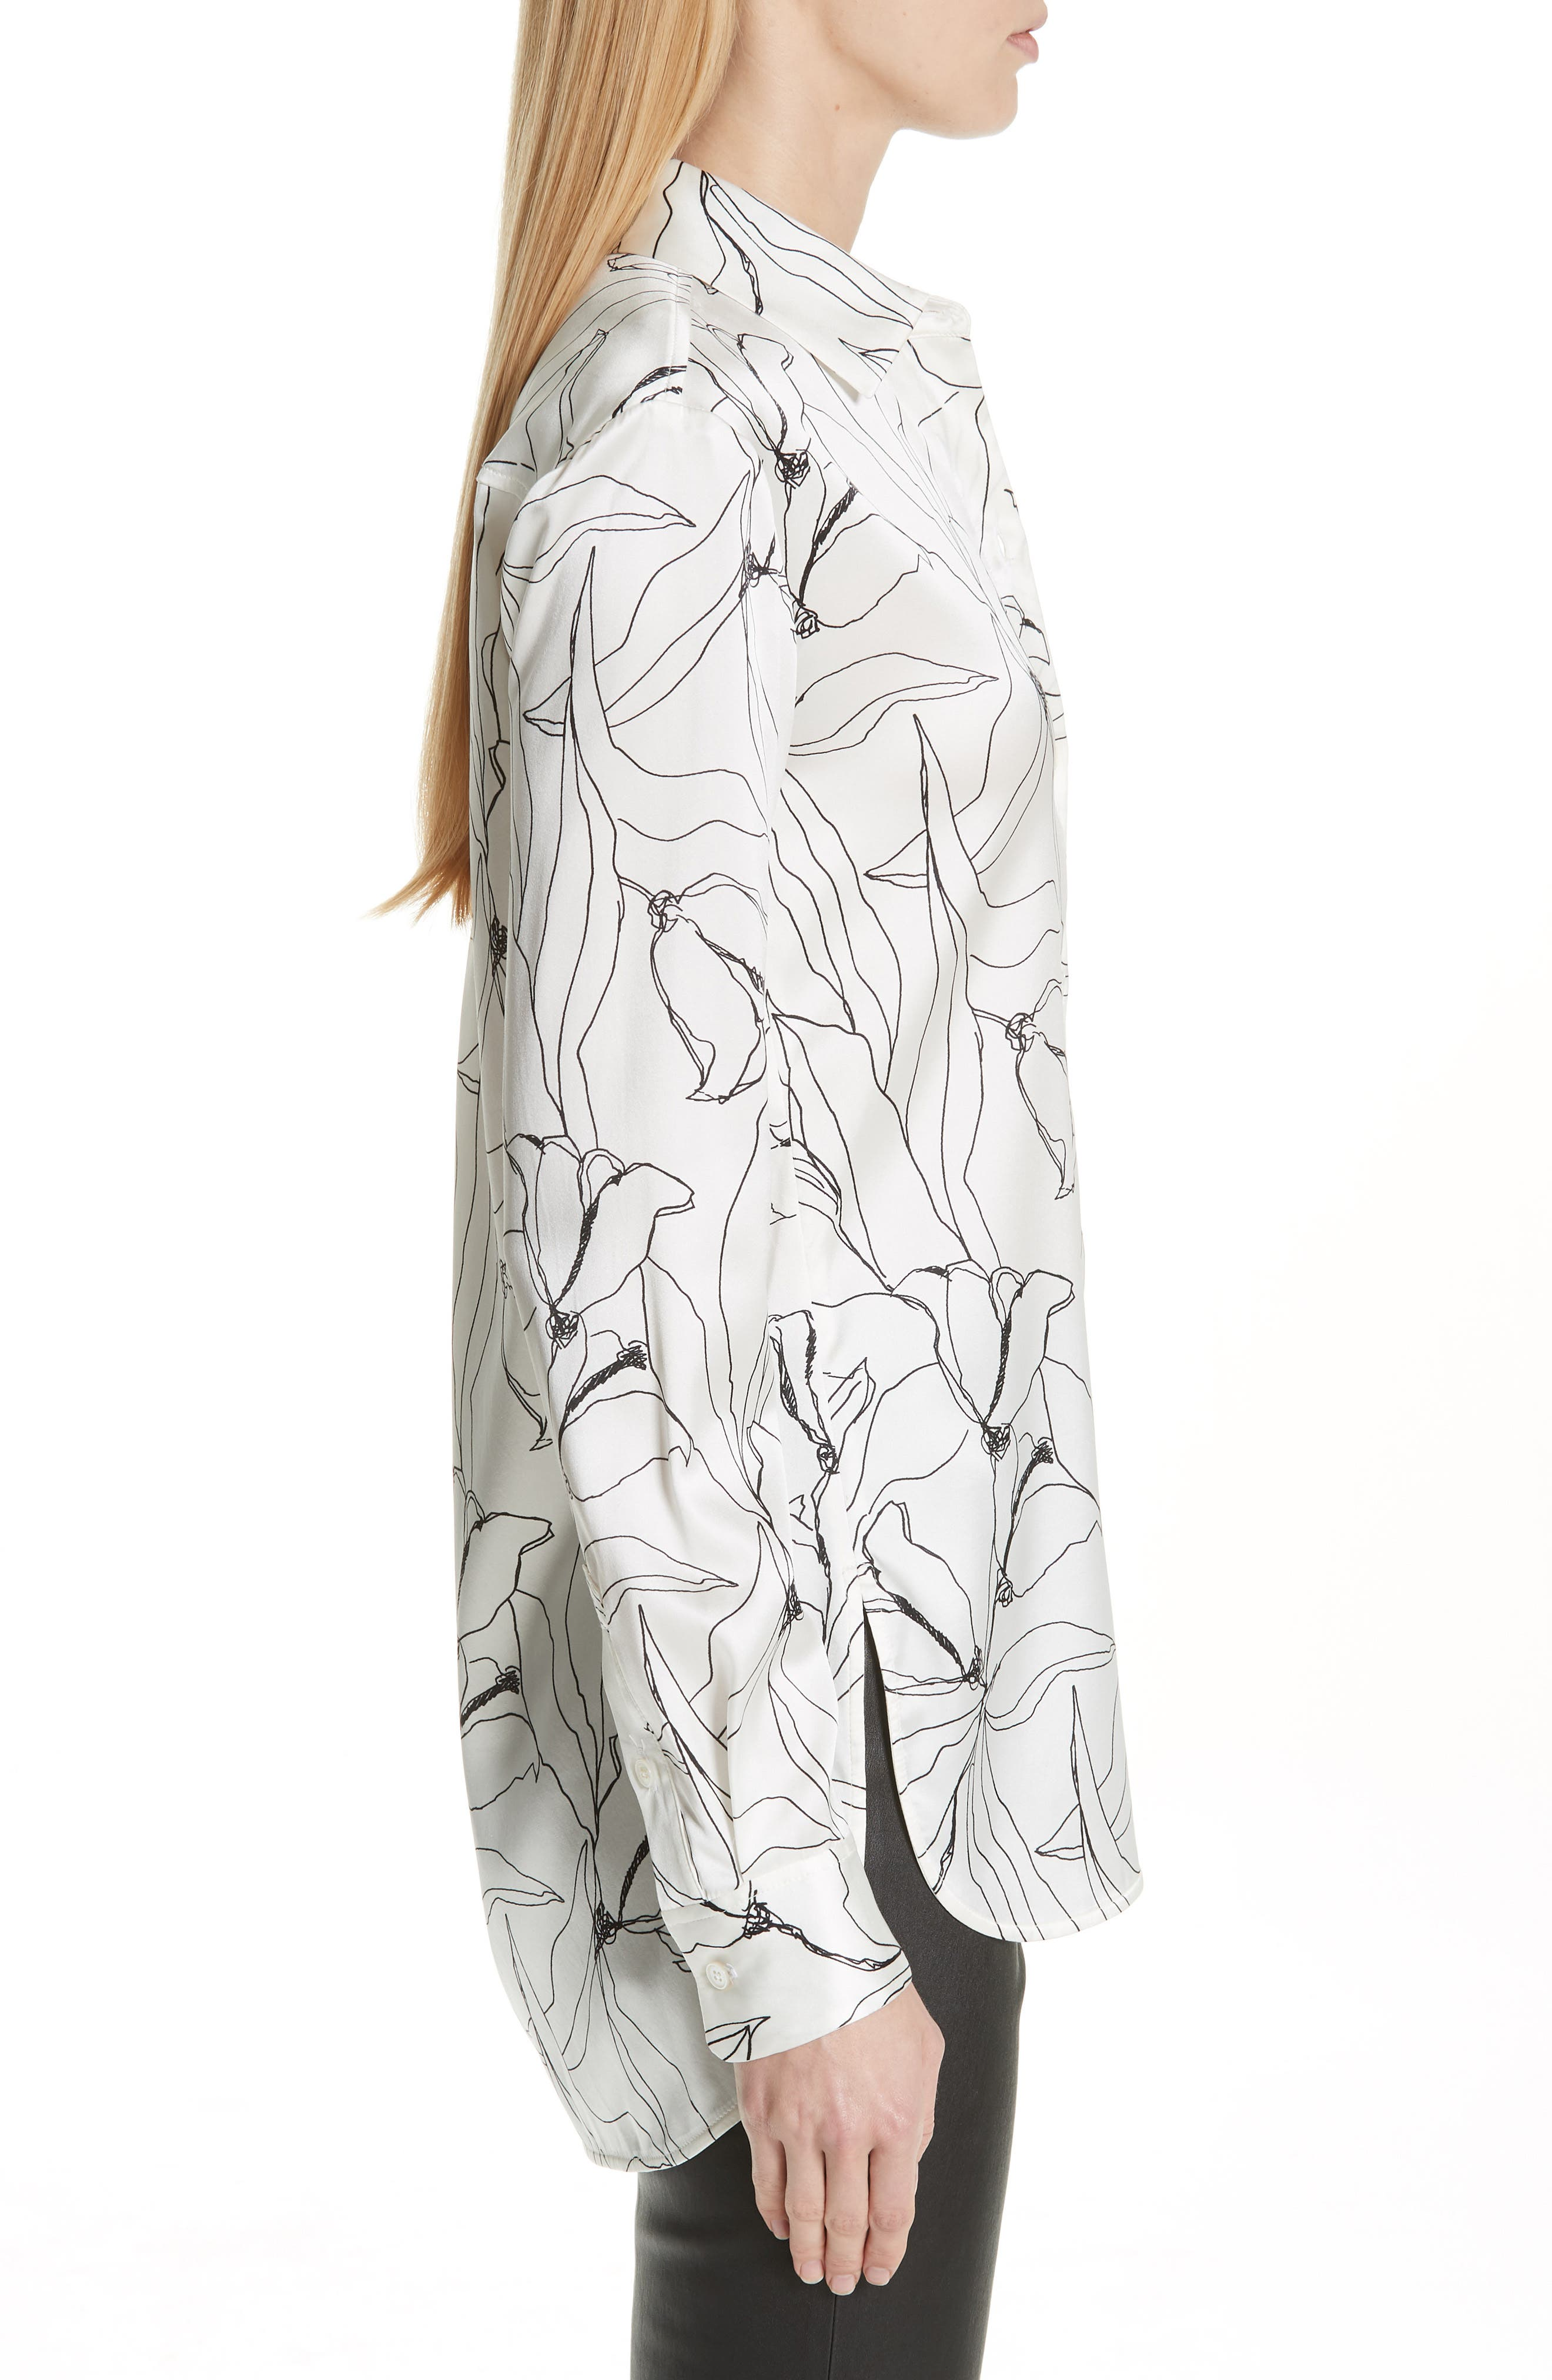 ST. JOHN COLLECTION,                             Artisanal Floral Stretch Silk Blouse,                             Alternate thumbnail 3, color,                             CREAM/ CAVIAR